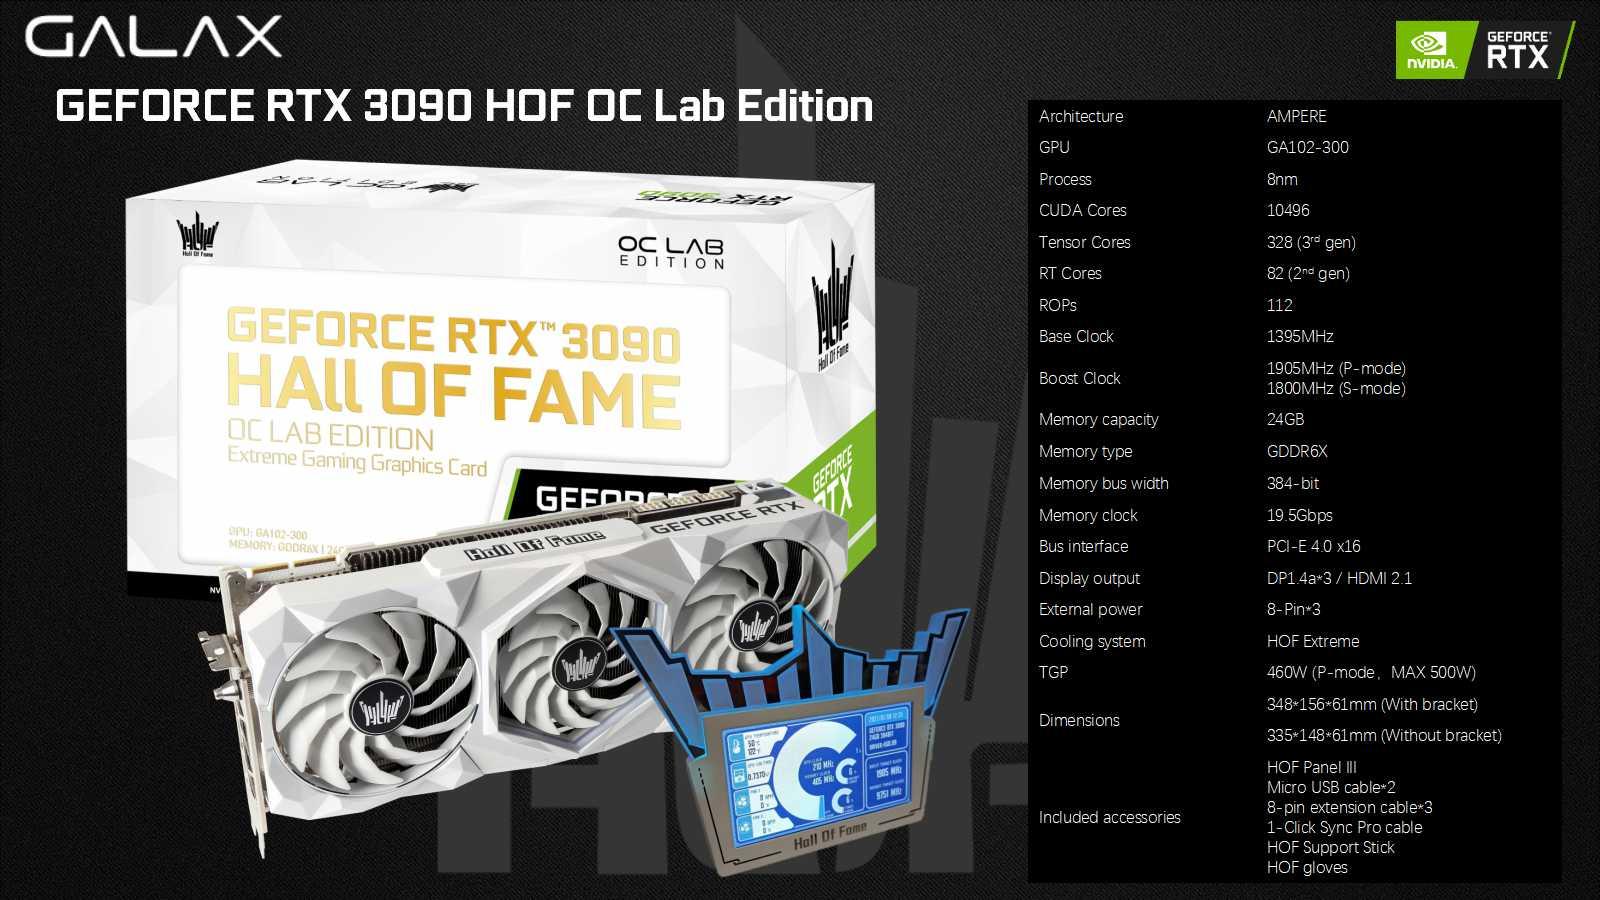 GALAX RTX 3090 HOF OC Lab Edition